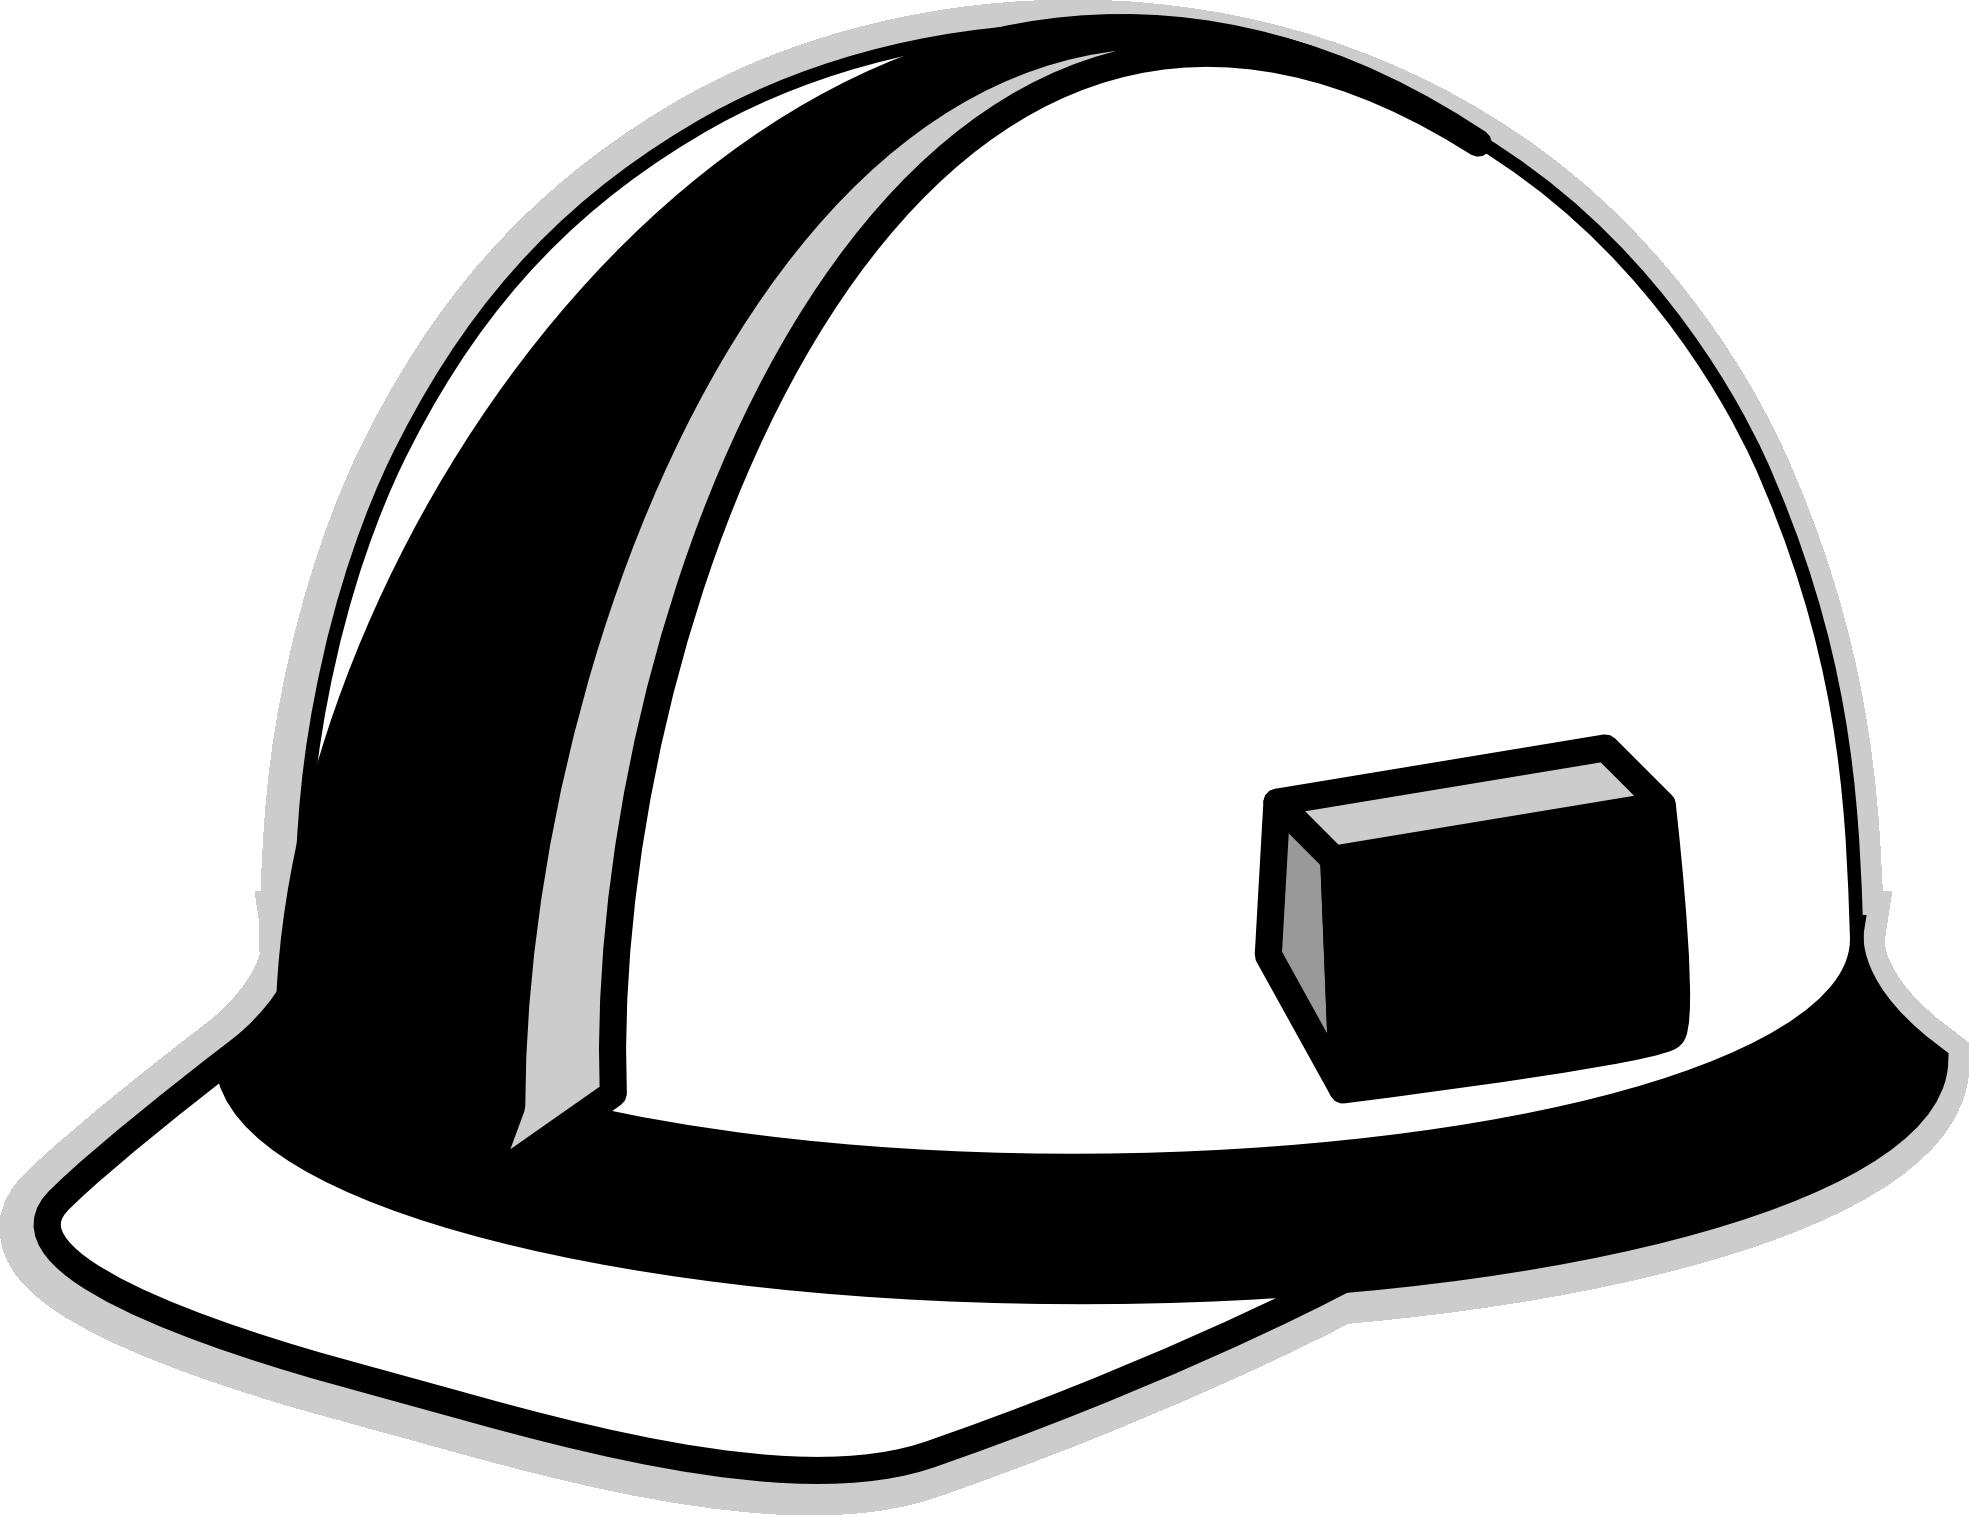 Backwards baseball cap clipart transparent download Hat Clipart Black And White transparent download